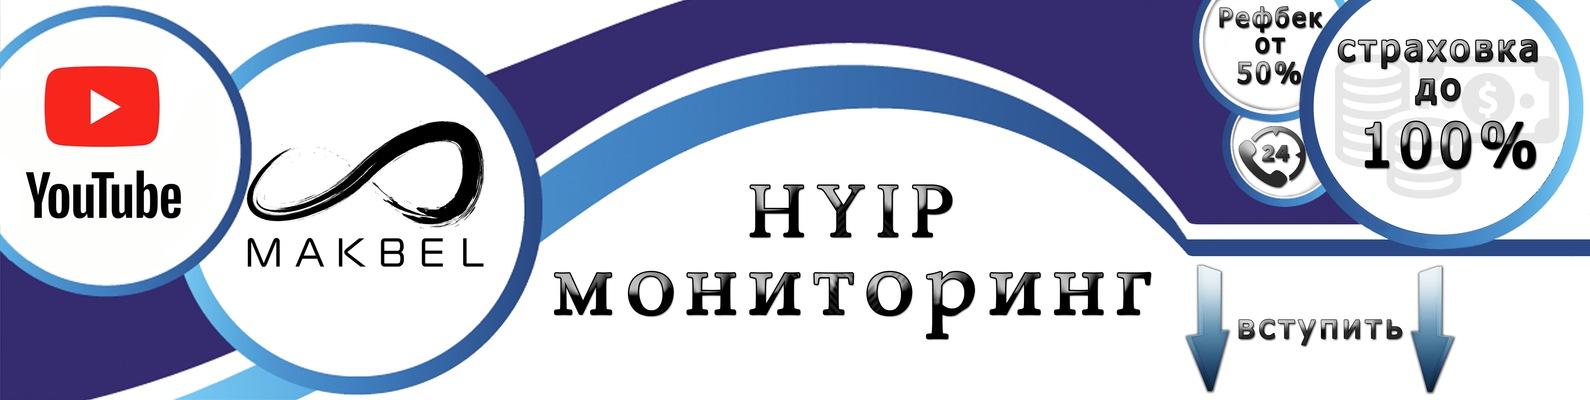 Мониторинг хайп сайтов вконтакте